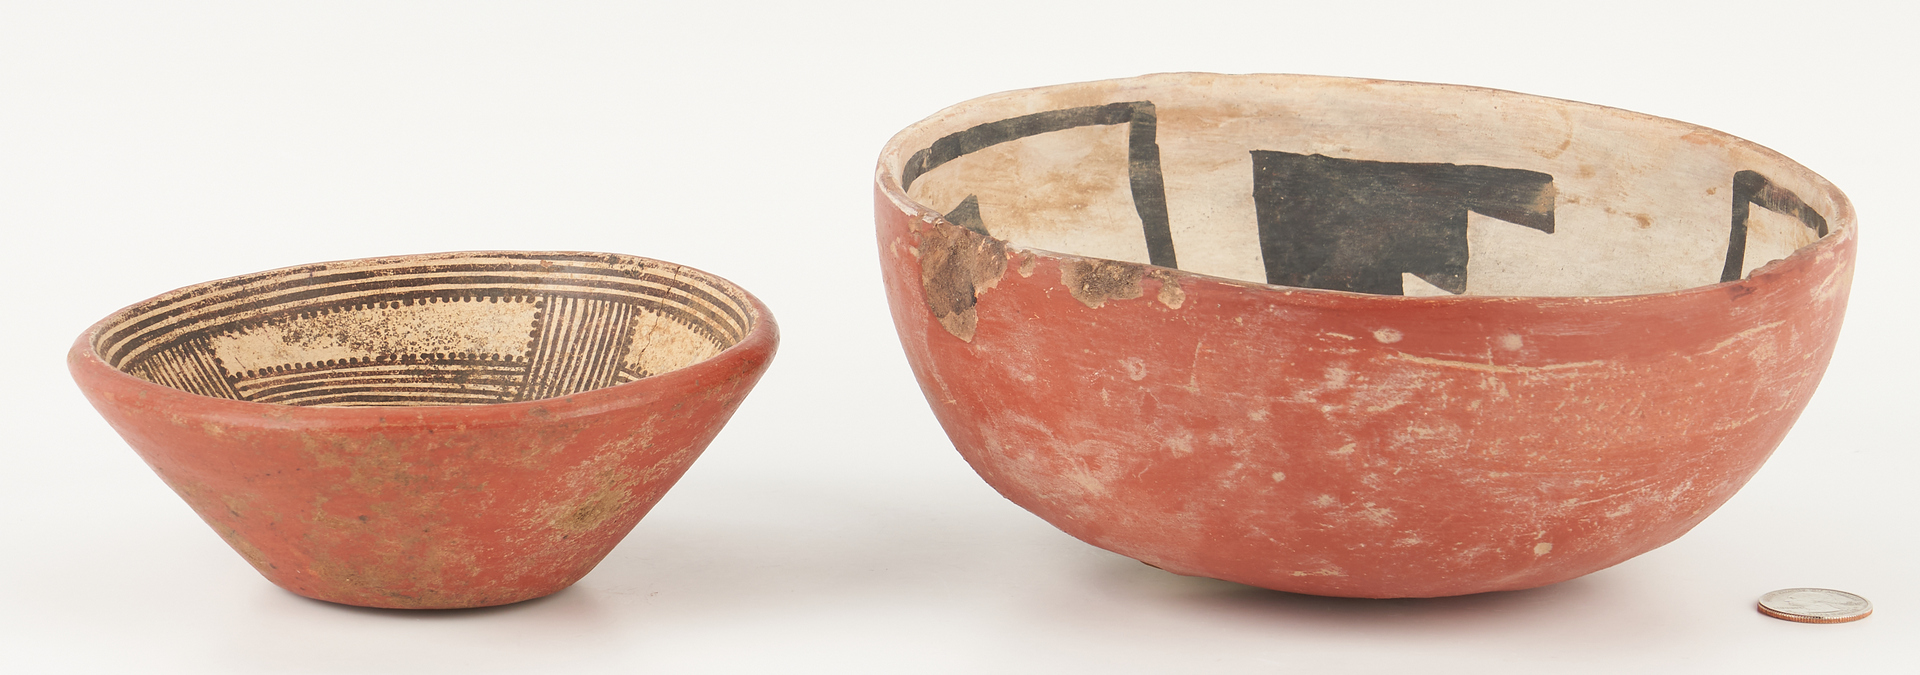 Lot 1111: 2 Native American Polychrome Pottery Bowls